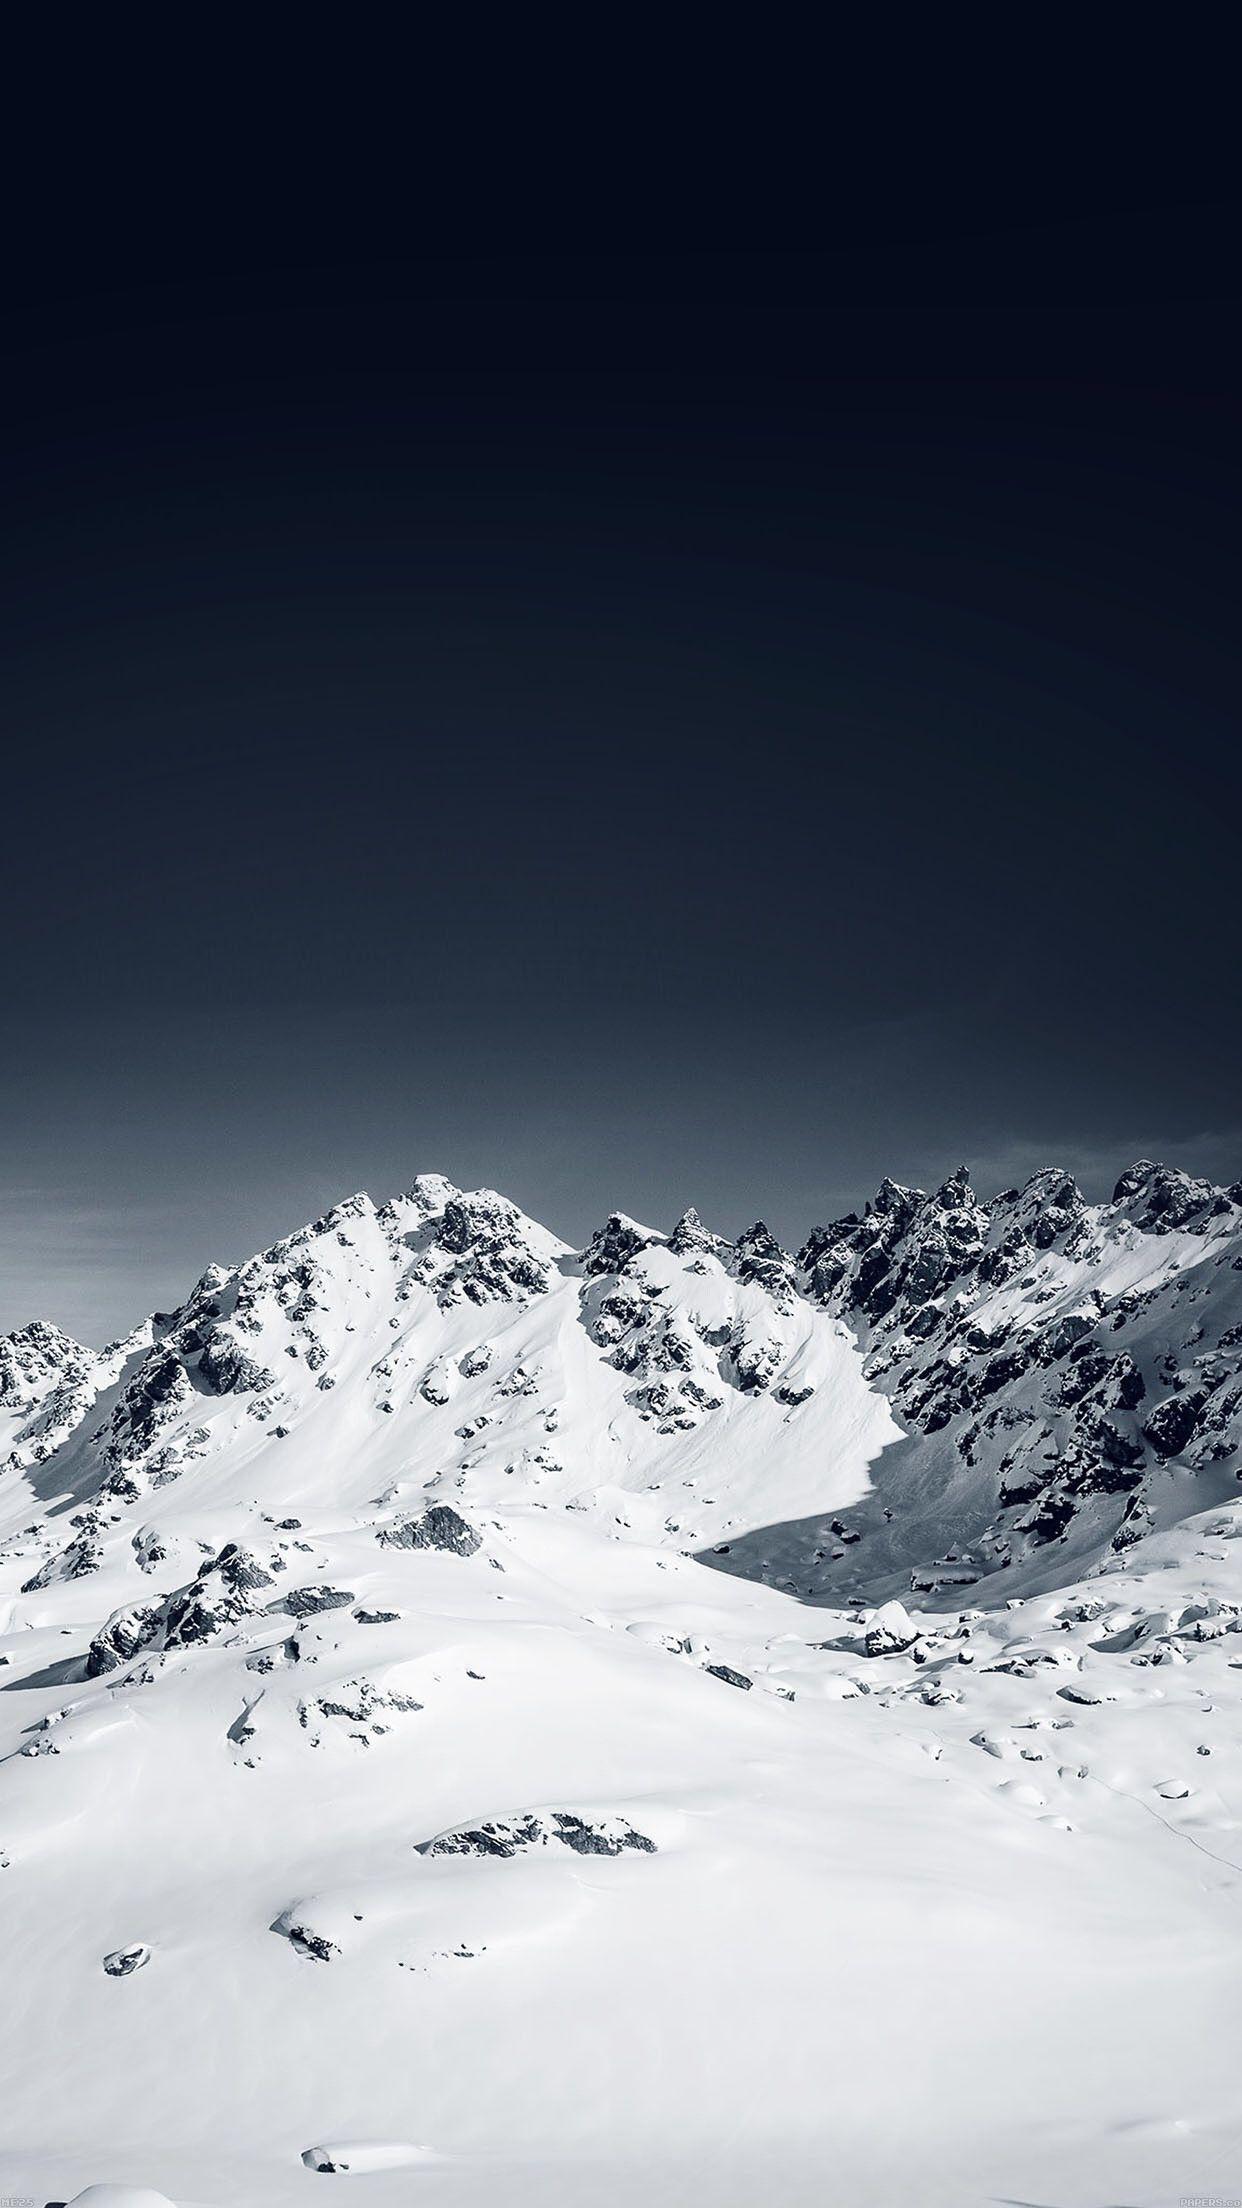 21 Amazing Winter iPhone Wallpaper : iPhone wallpaper - iphone background, wallpaper desktop, phone wallpaper #winter #snow #wallpaper